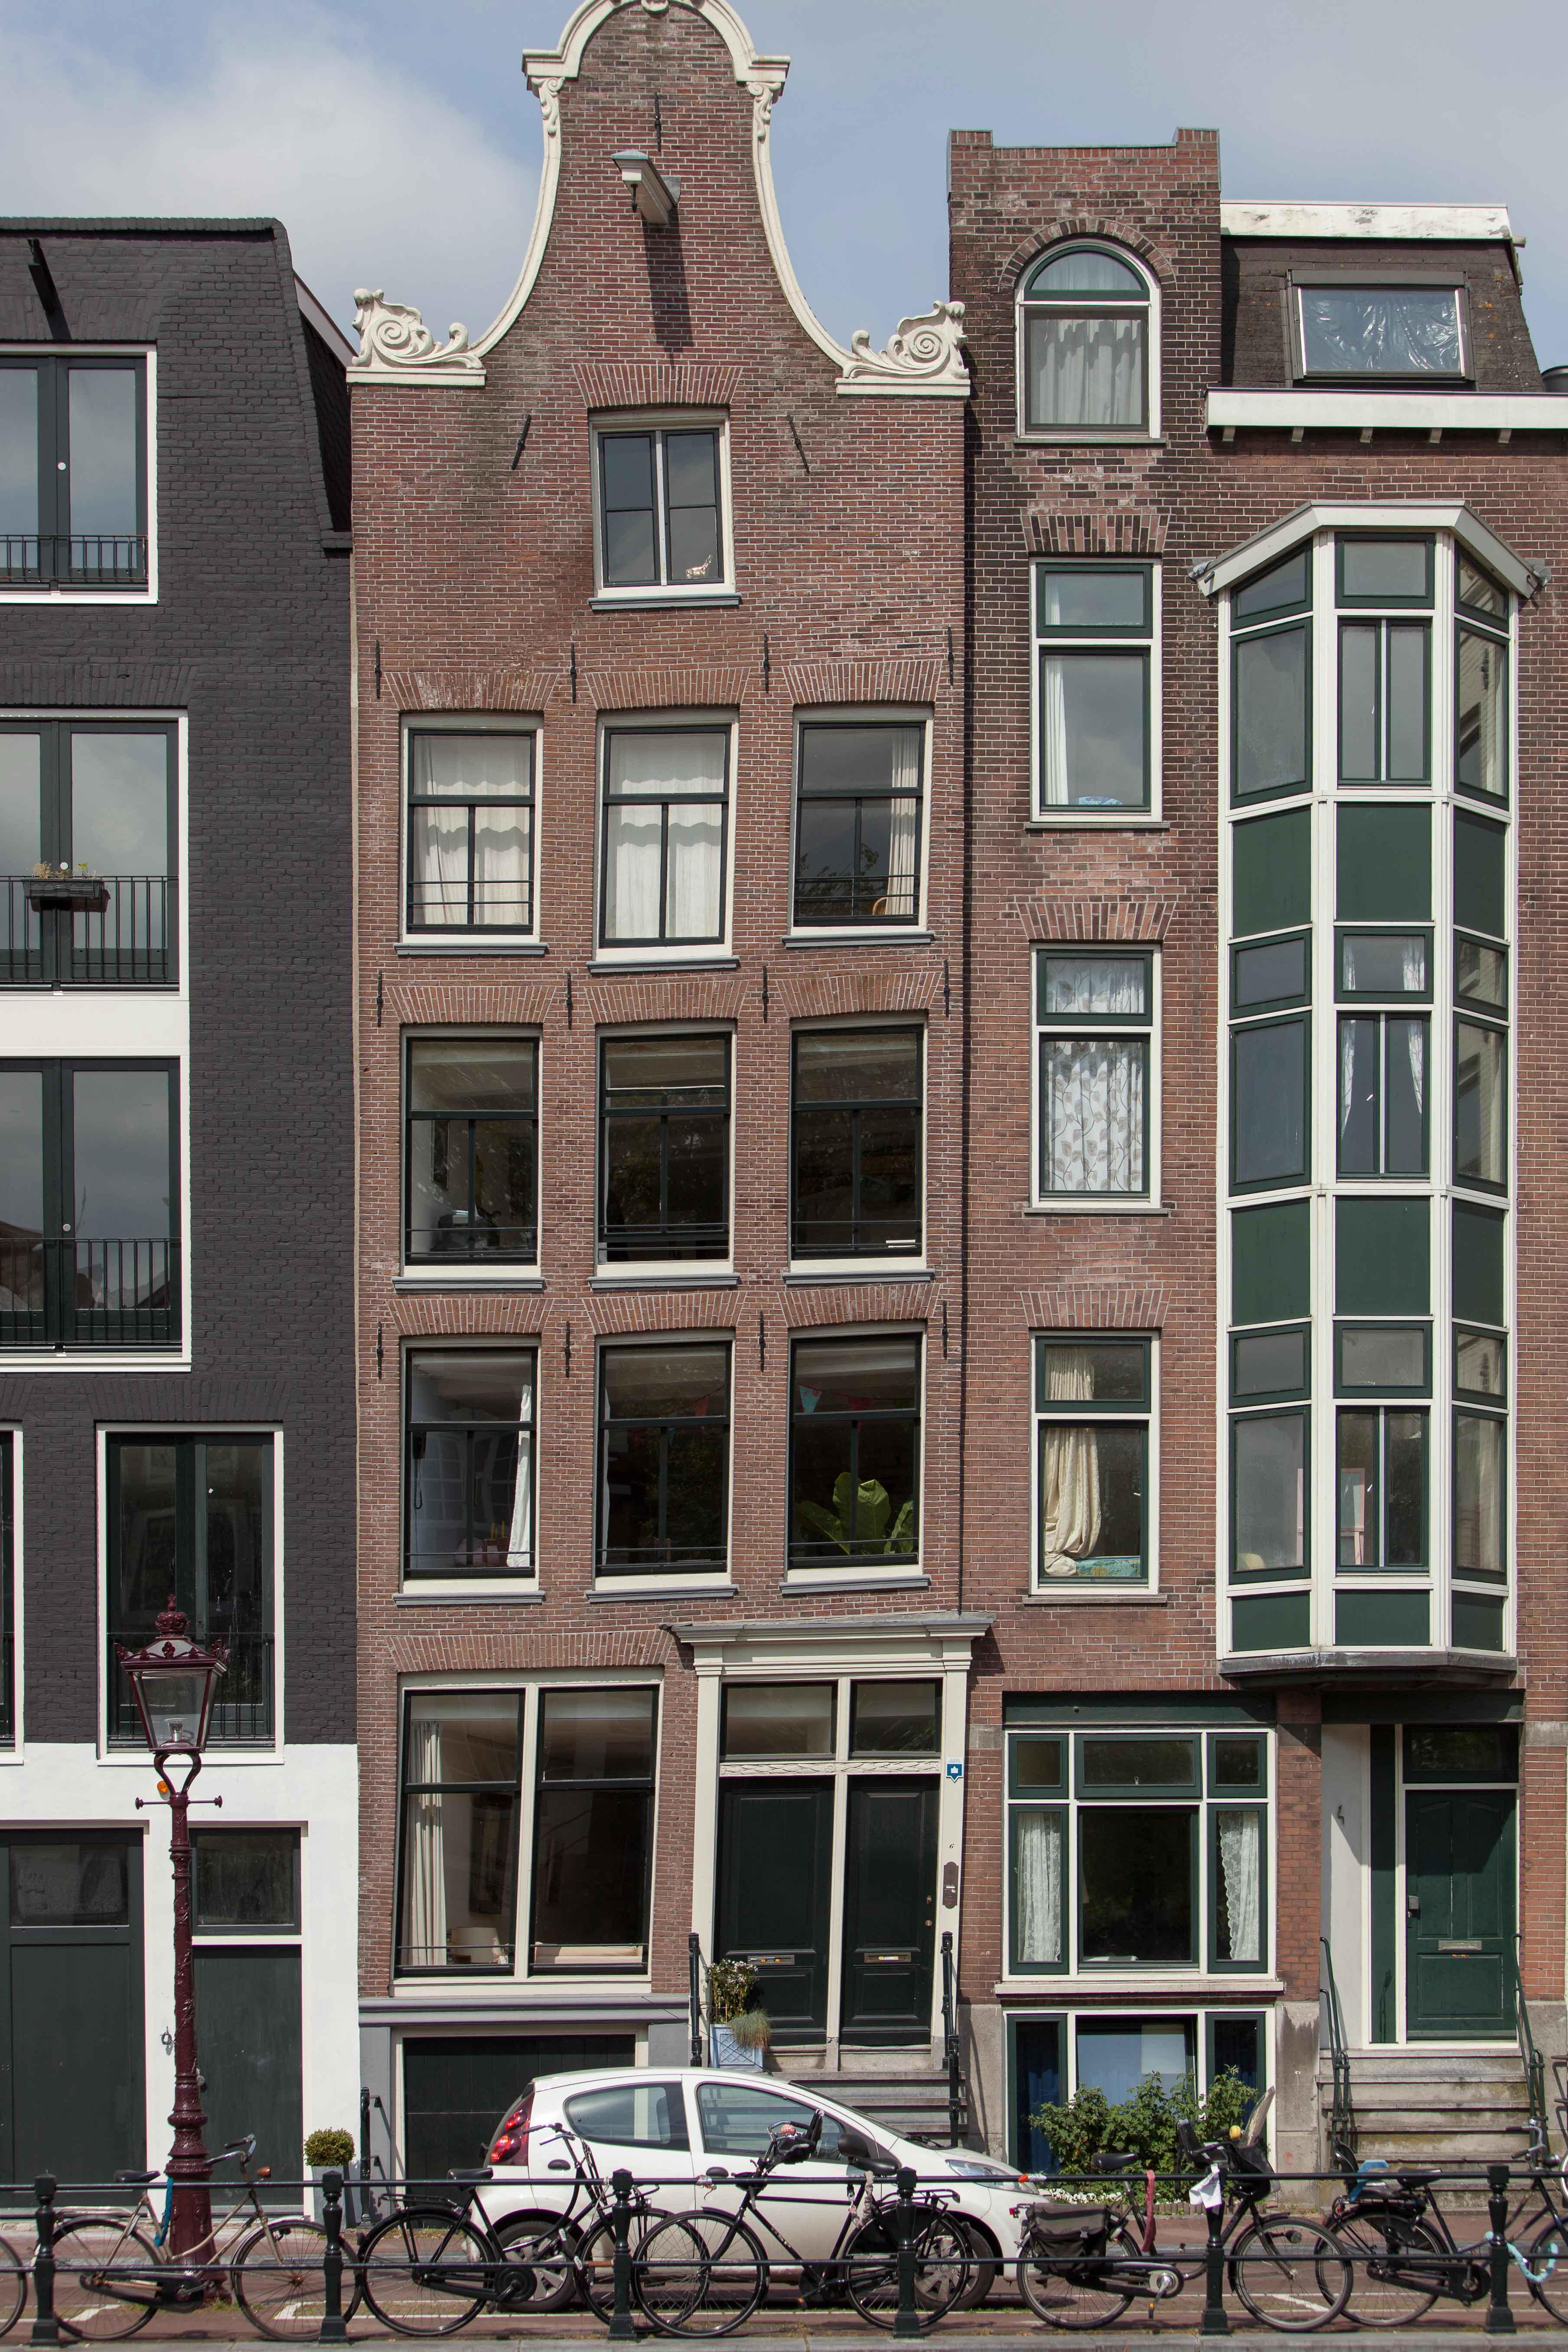 Amsterdam_2014_05_04_IFB_9119_LR5_Intern